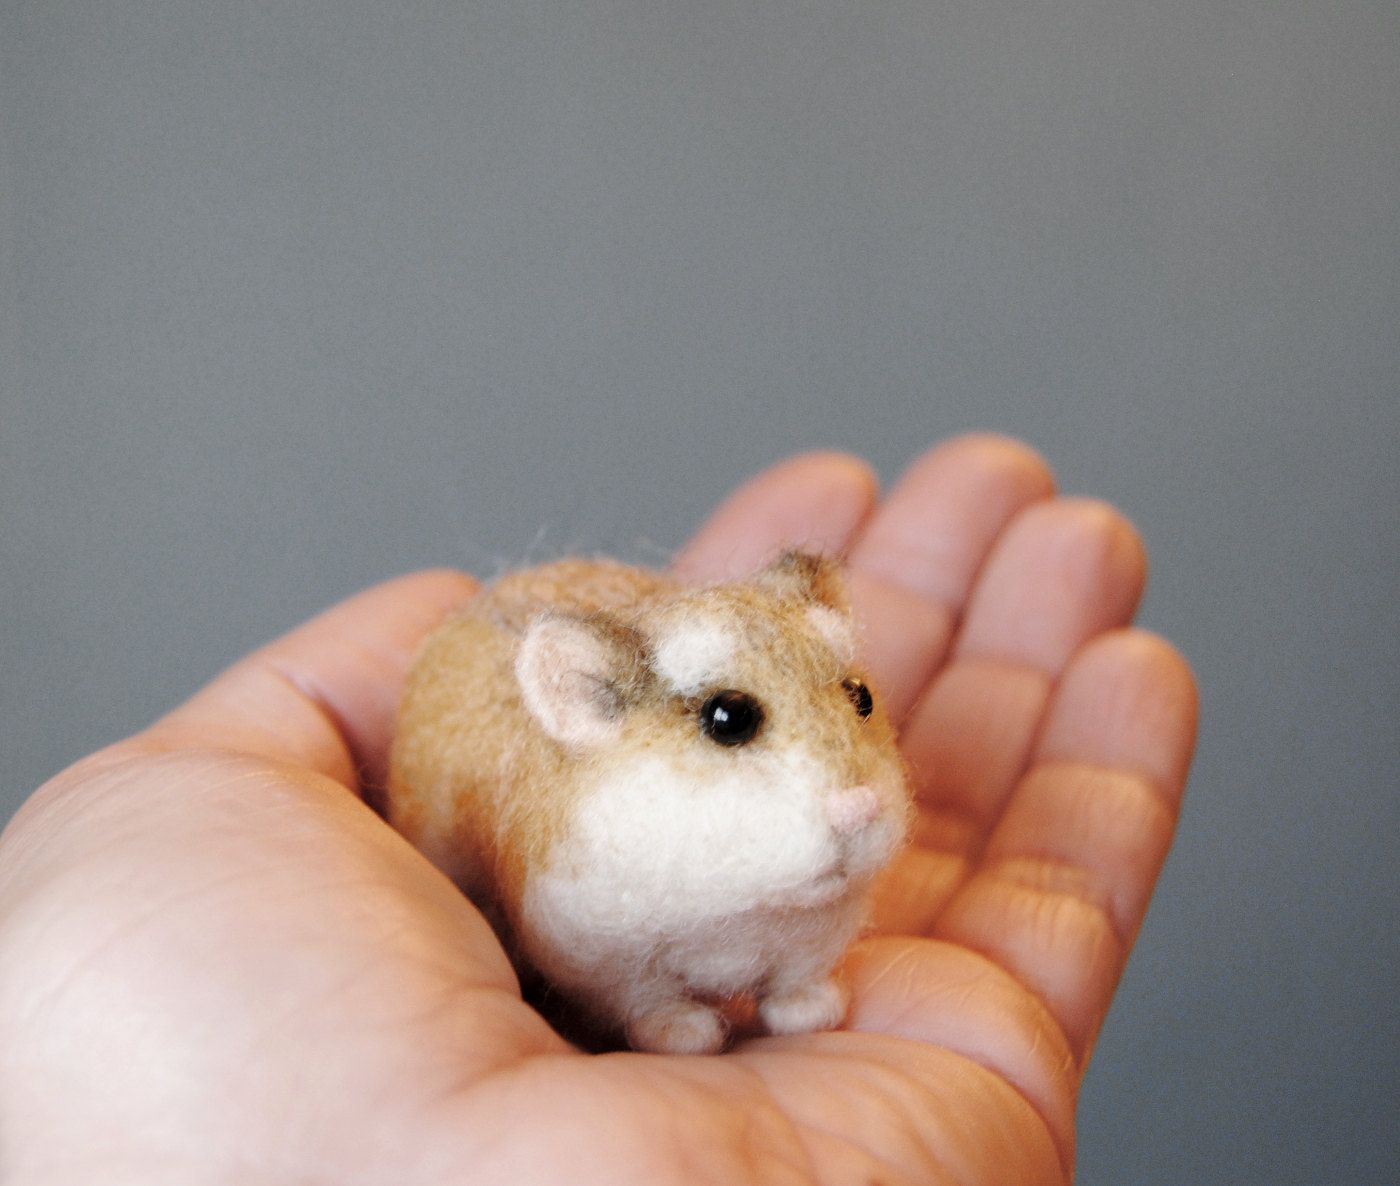 Robo Dwarf Hamster Realistic Needle Felted Hamster Roborovski Hamster Handmade Animal Made To Order Dwarf Hamster Robo Dwarf Hamsters Felt Animals